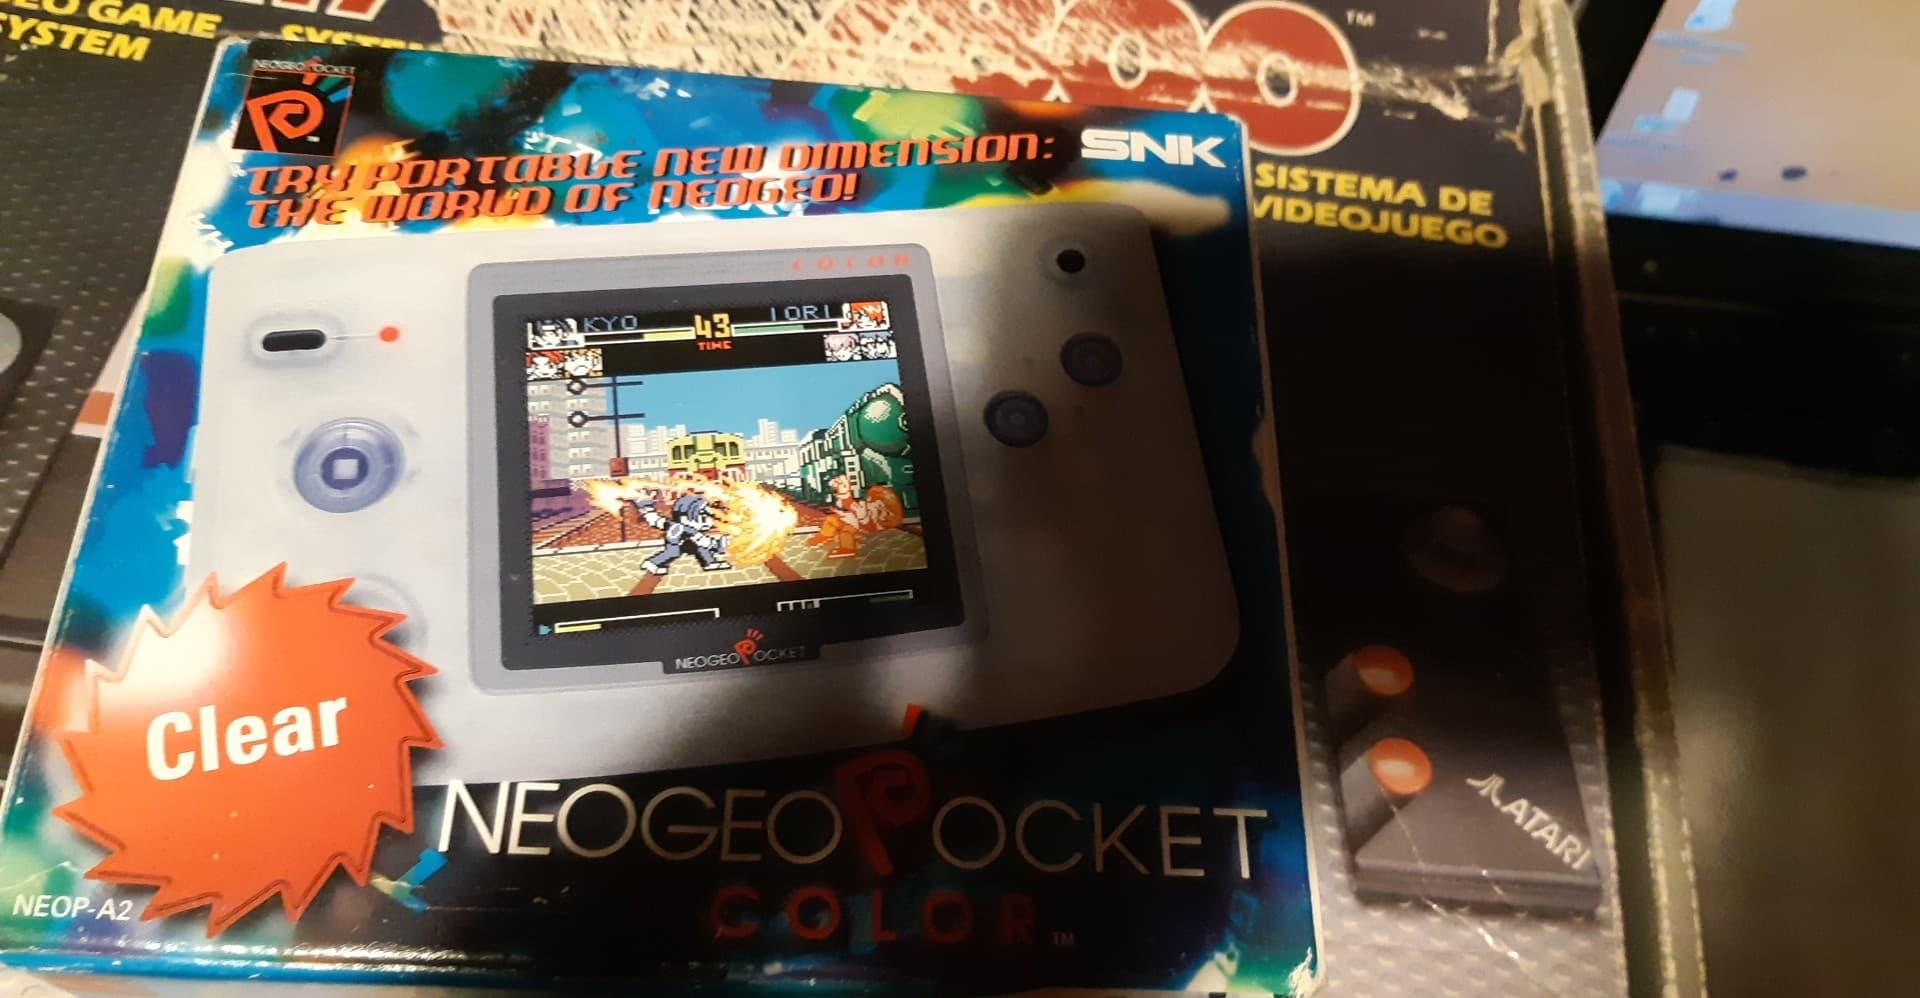 Neo Geo Pocket